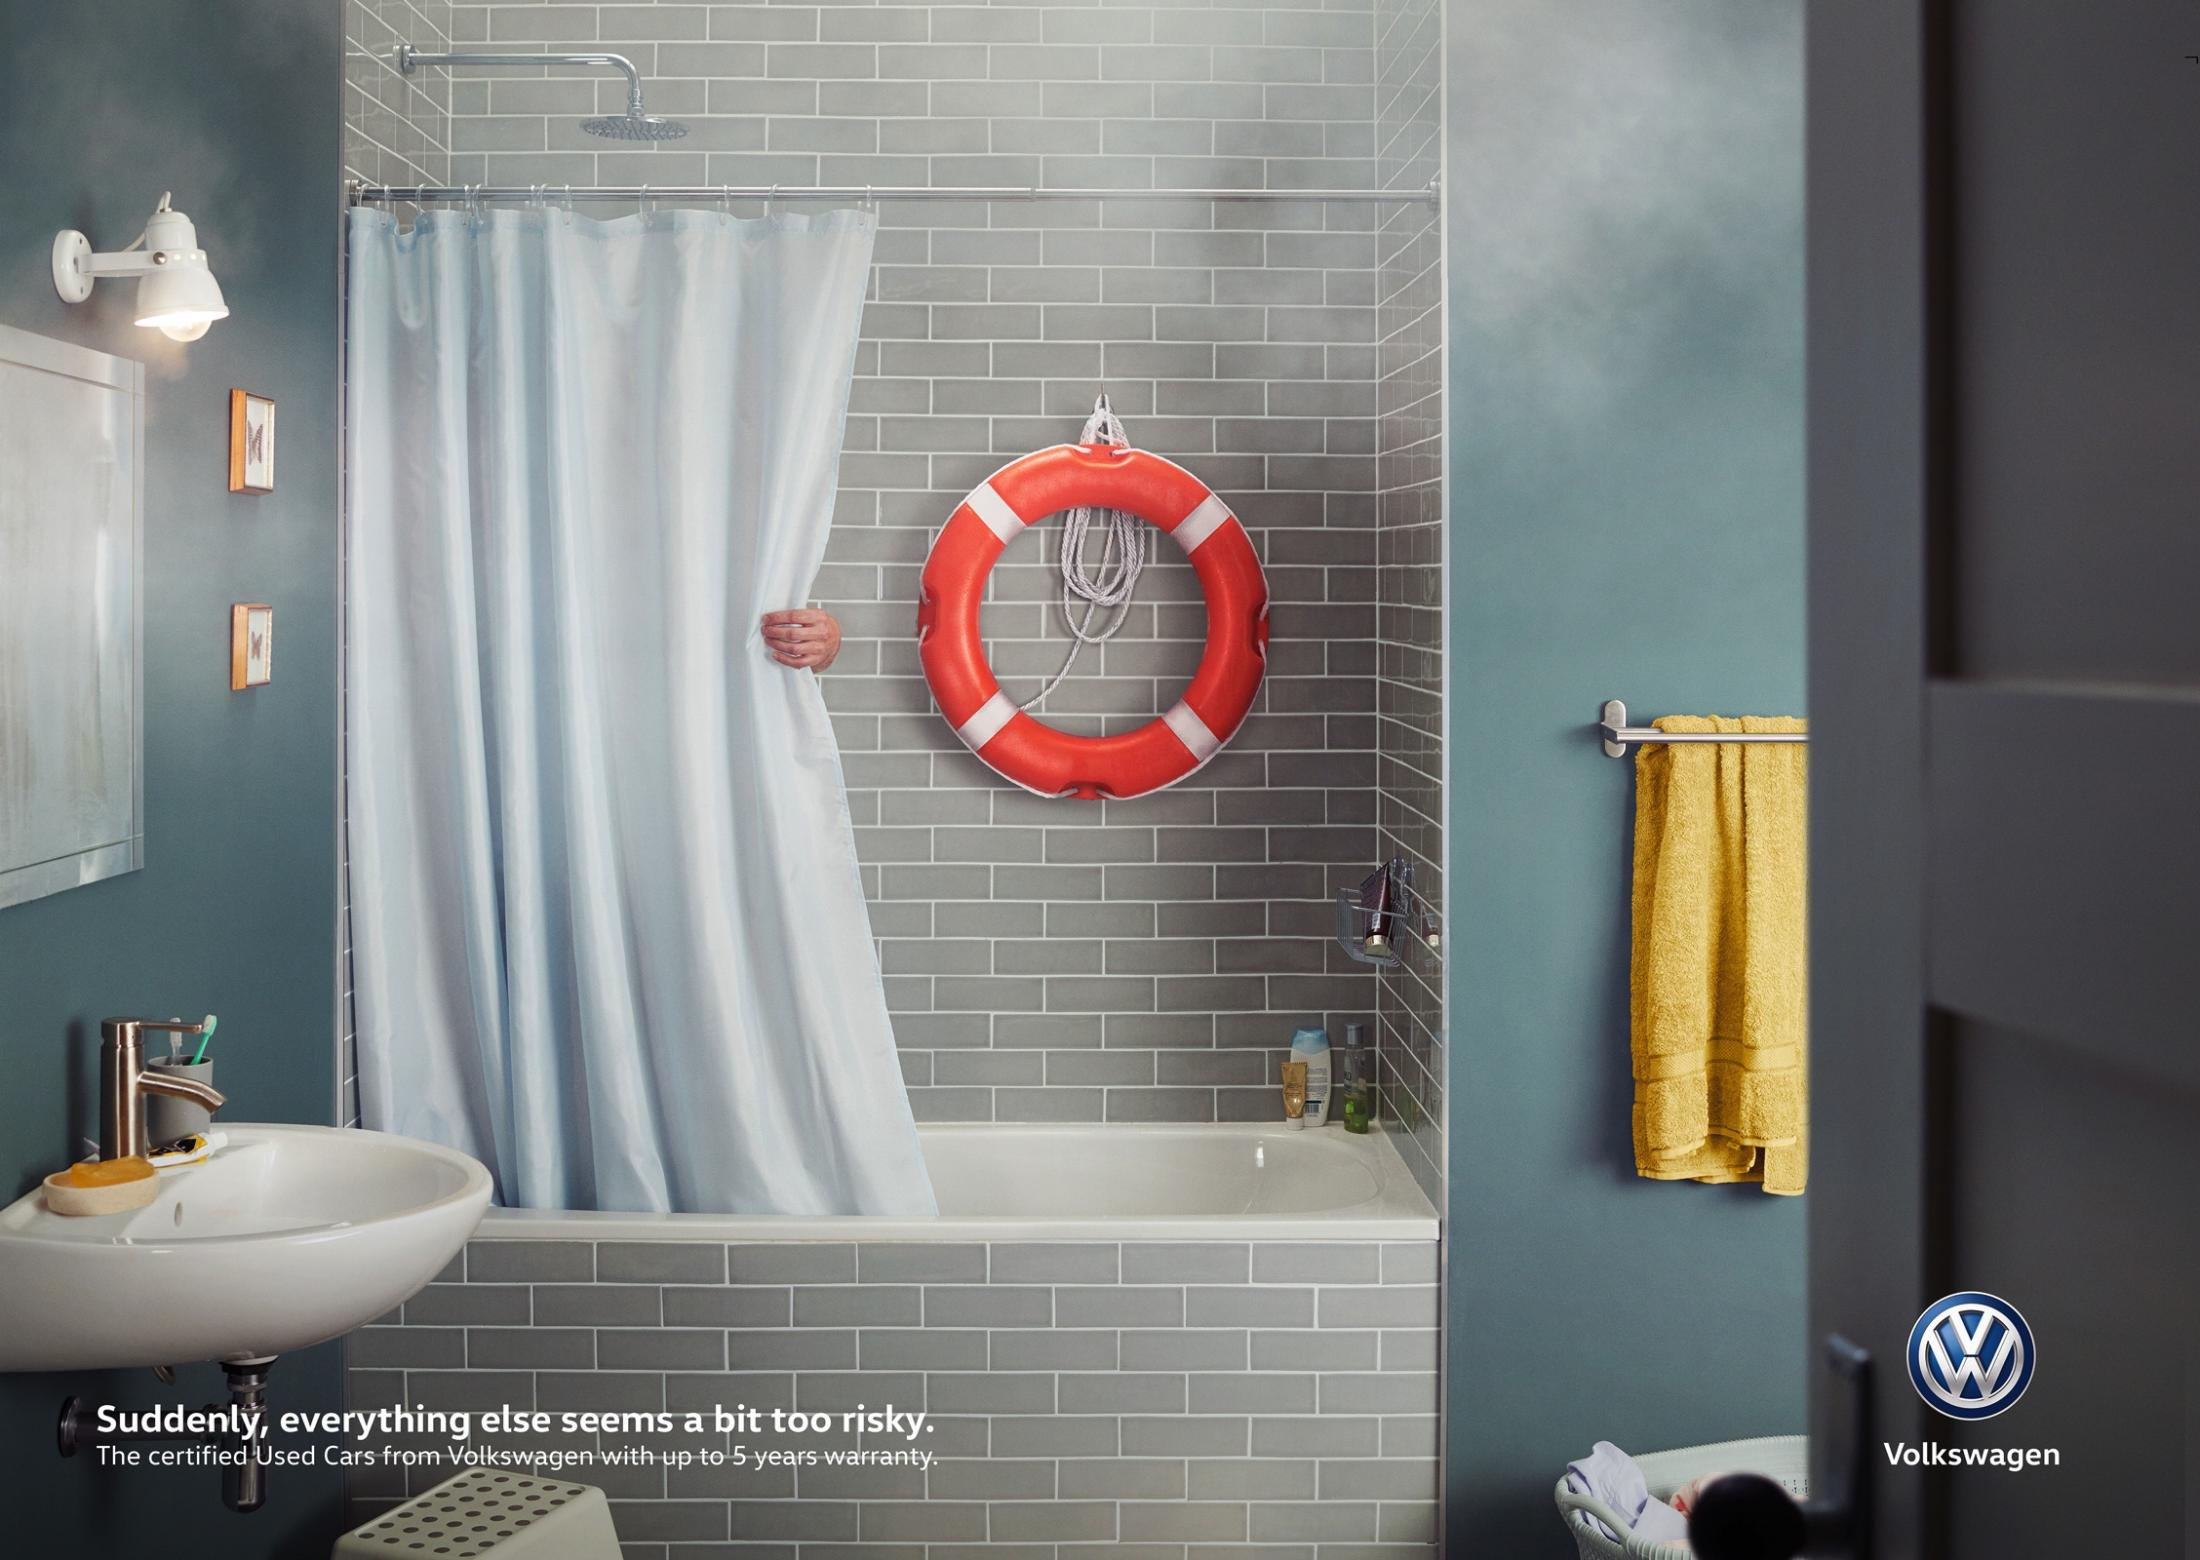 Volkswagen Print Ad - A Bit Too Risky - Shower